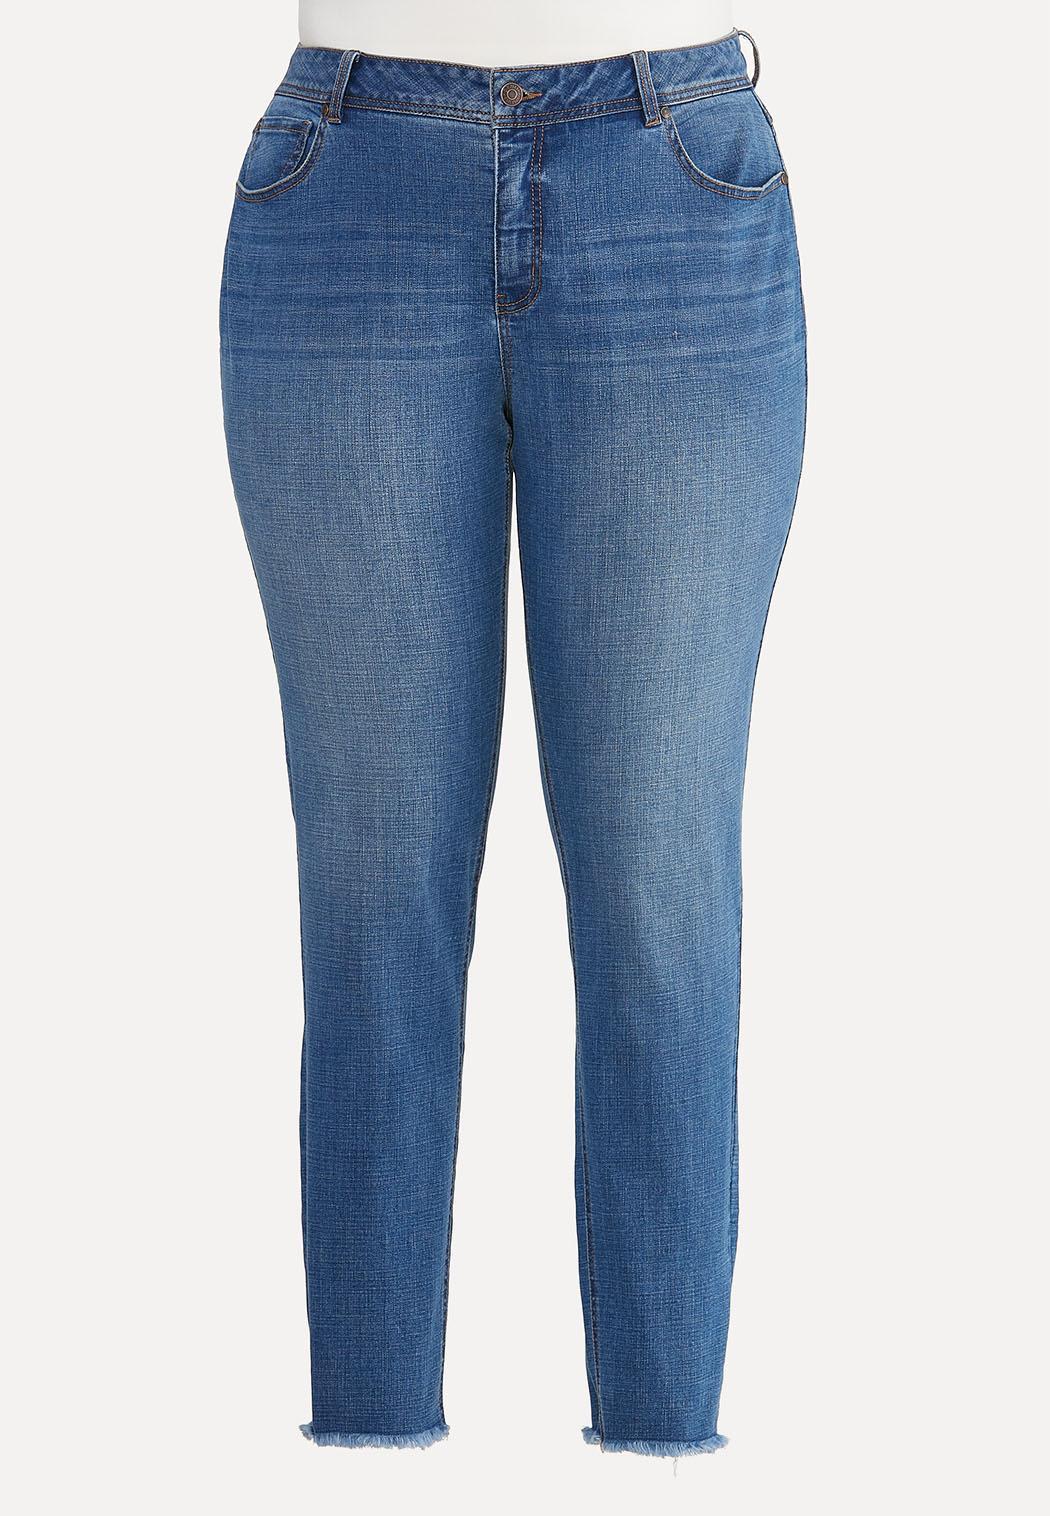 Plus Size Frayed Skinny Jeans